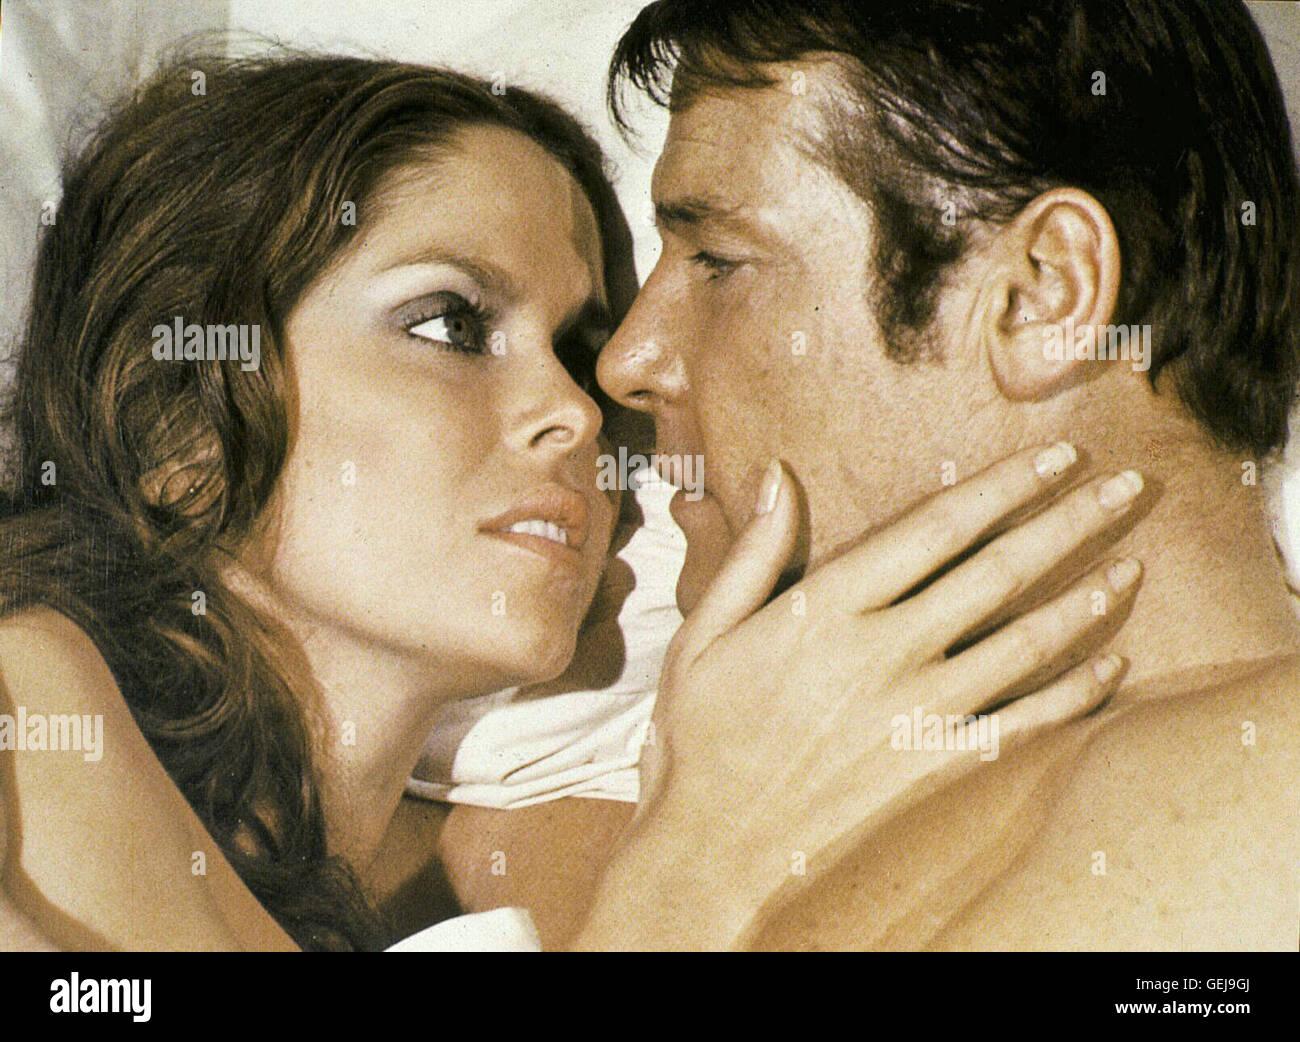 Barbara Bach, Roger Moore Die russische Agentin Anya (Barbara Bach) findet Gefallen an Superagent James Bond (Roger - Stock Image